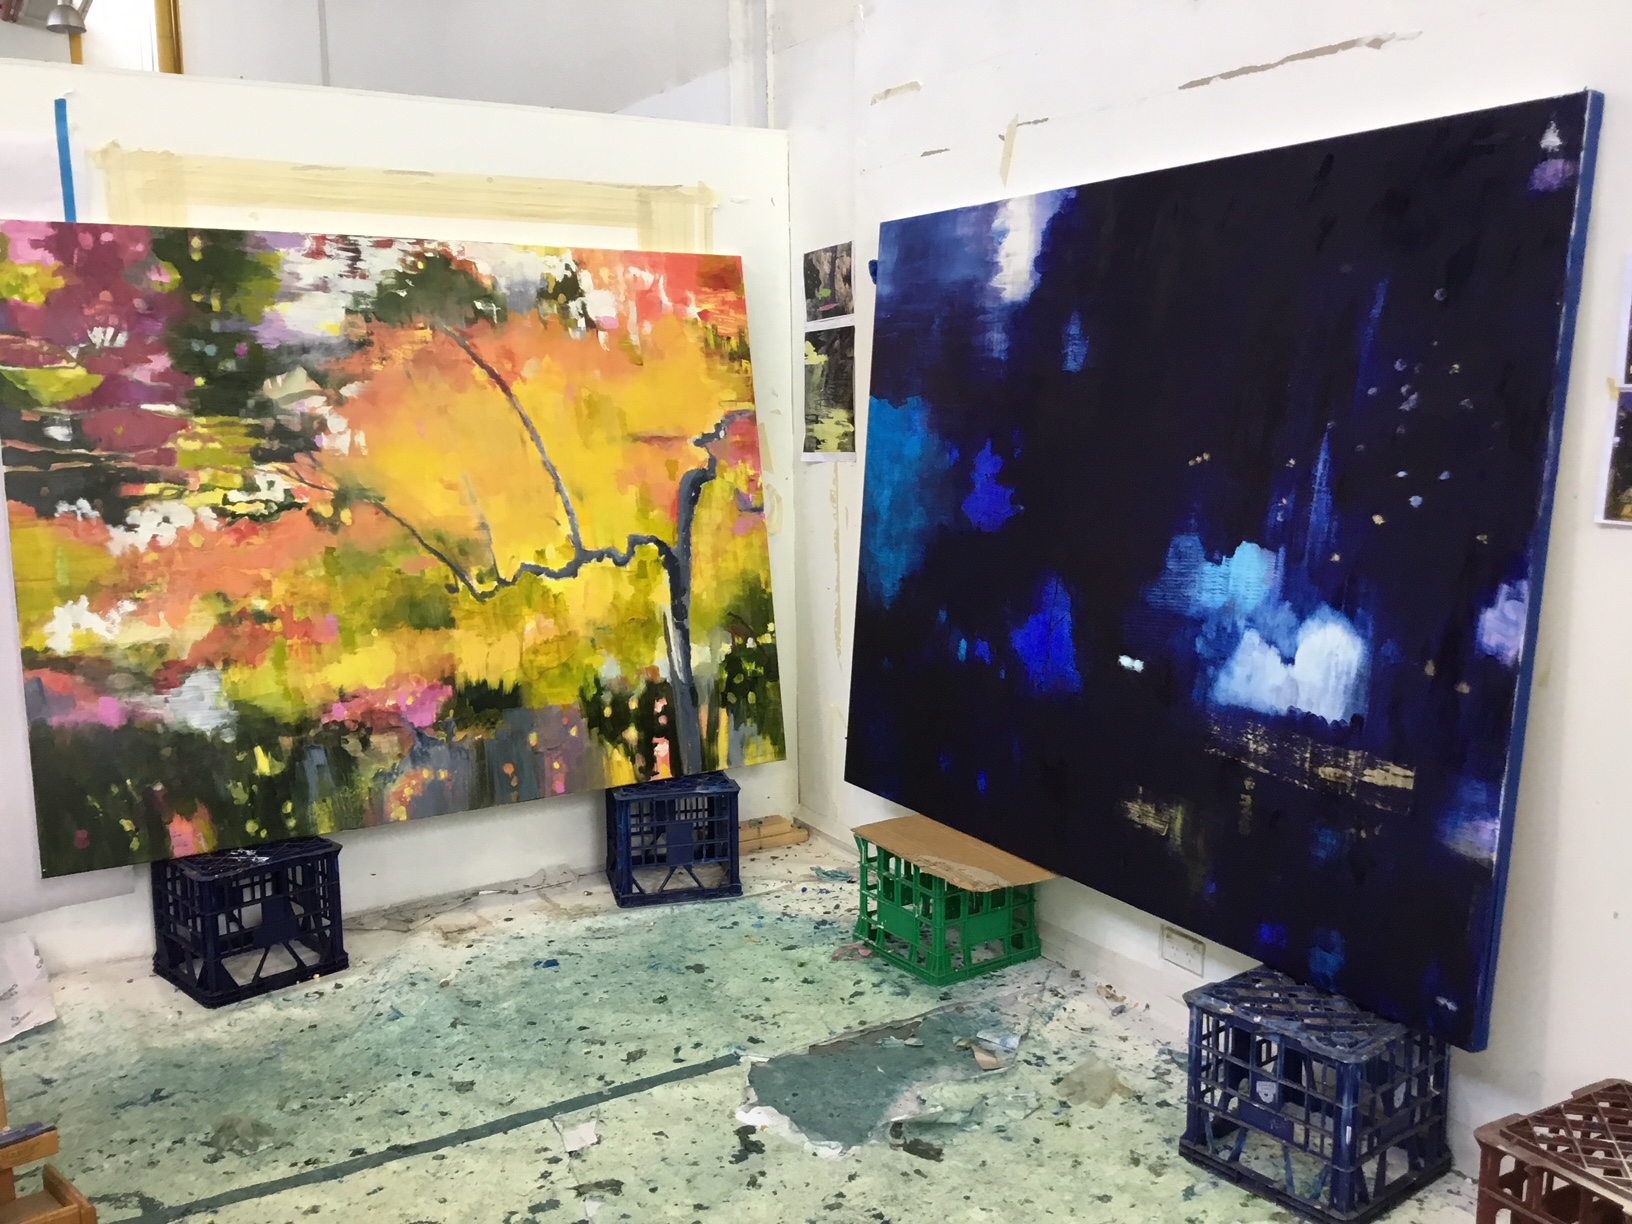 Suey McEnnallyThe Brightness of Day/ Wild Lights of Night3-25 February 2018 - Paintings and Drawings